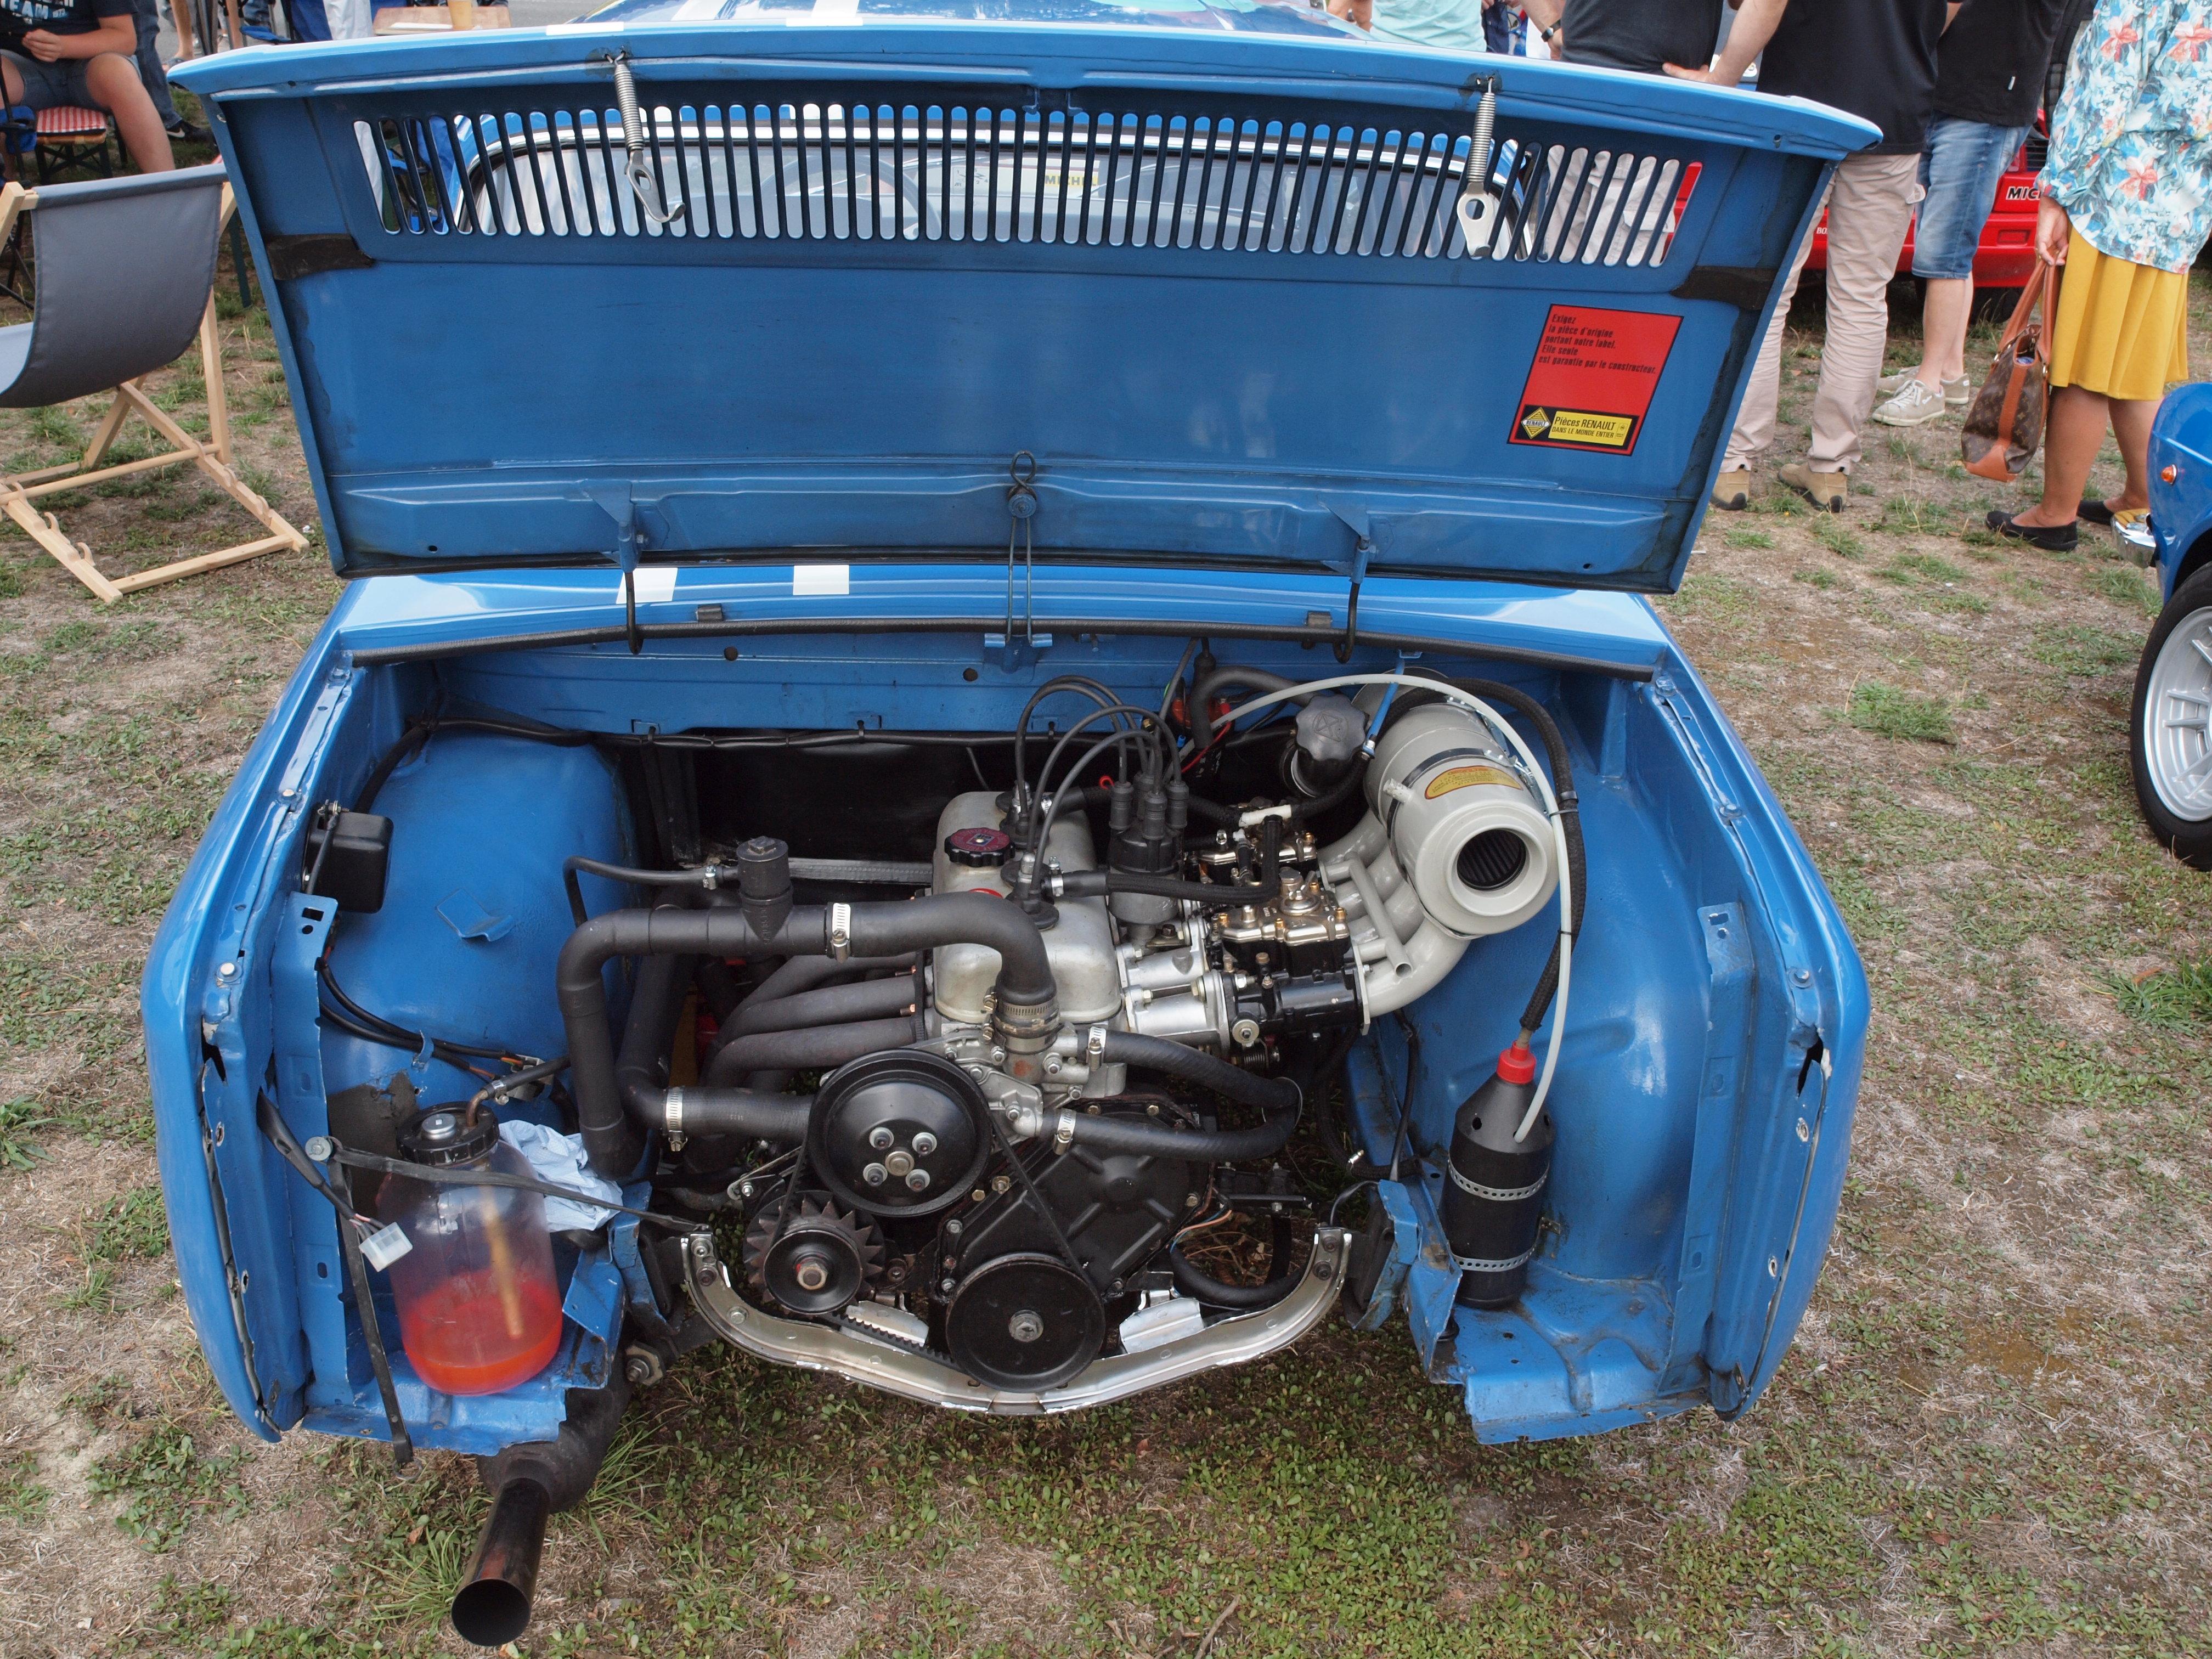 File Renault 8 Gordini Motor Aufgenommen Am 19 08 2018 In Diepholz Jpg Wikimedia Commons